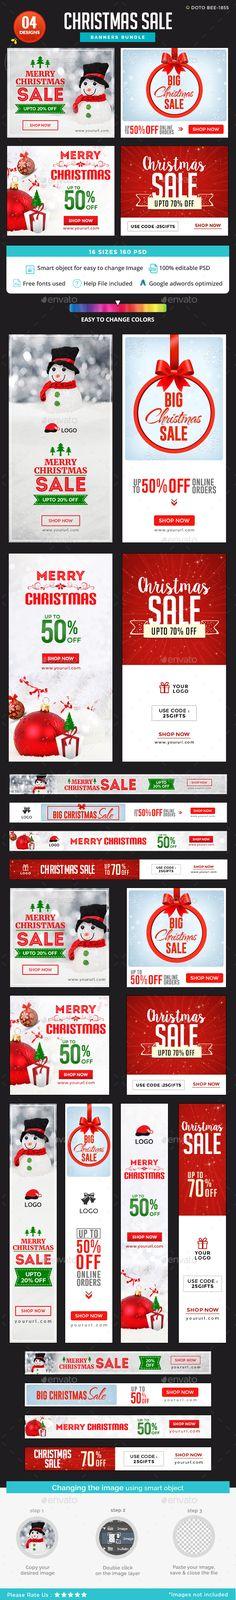 Christmas Sale Banner Design Template Bundle - 4 Sets - Banners & Ads Web Elements Design Template PSD. Download here: https://graphicriver.net/item/christmas-sale-banners-bundle-4-sets/19193009?ref=yinkira